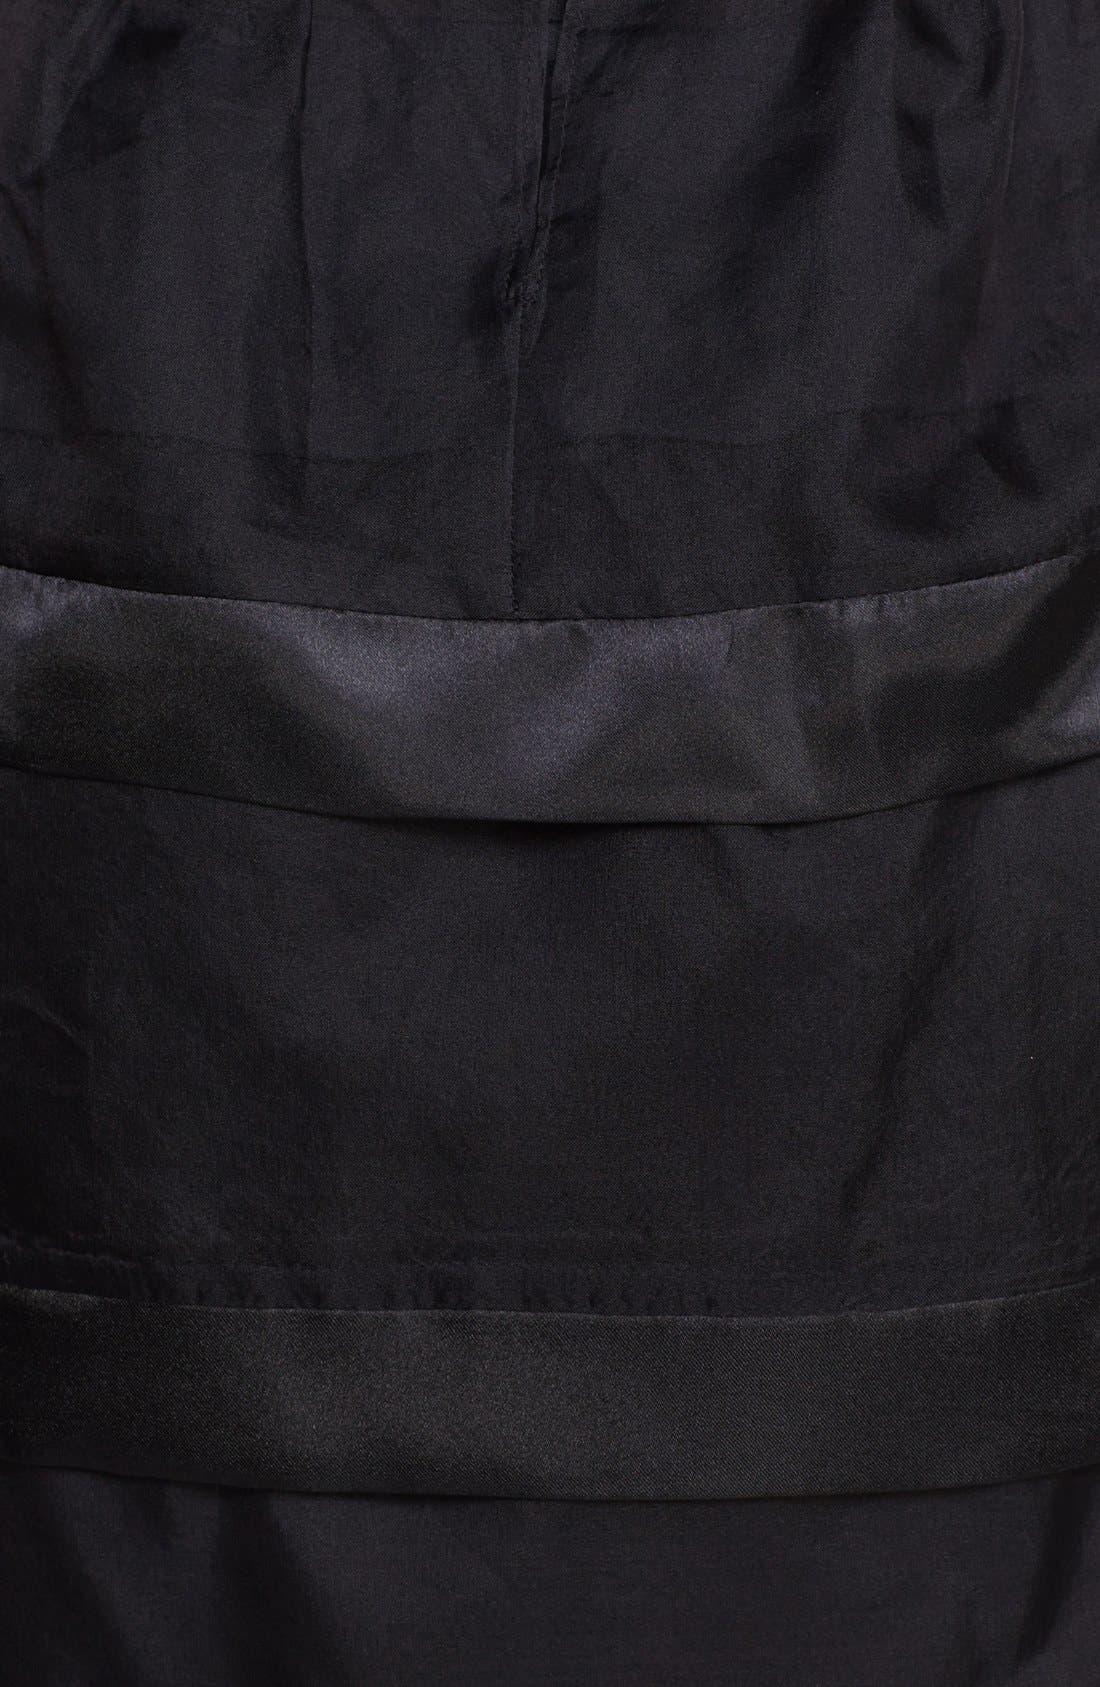 Alternate Image 3  - Taylor Dresses Tiered Fit & Flare Dress